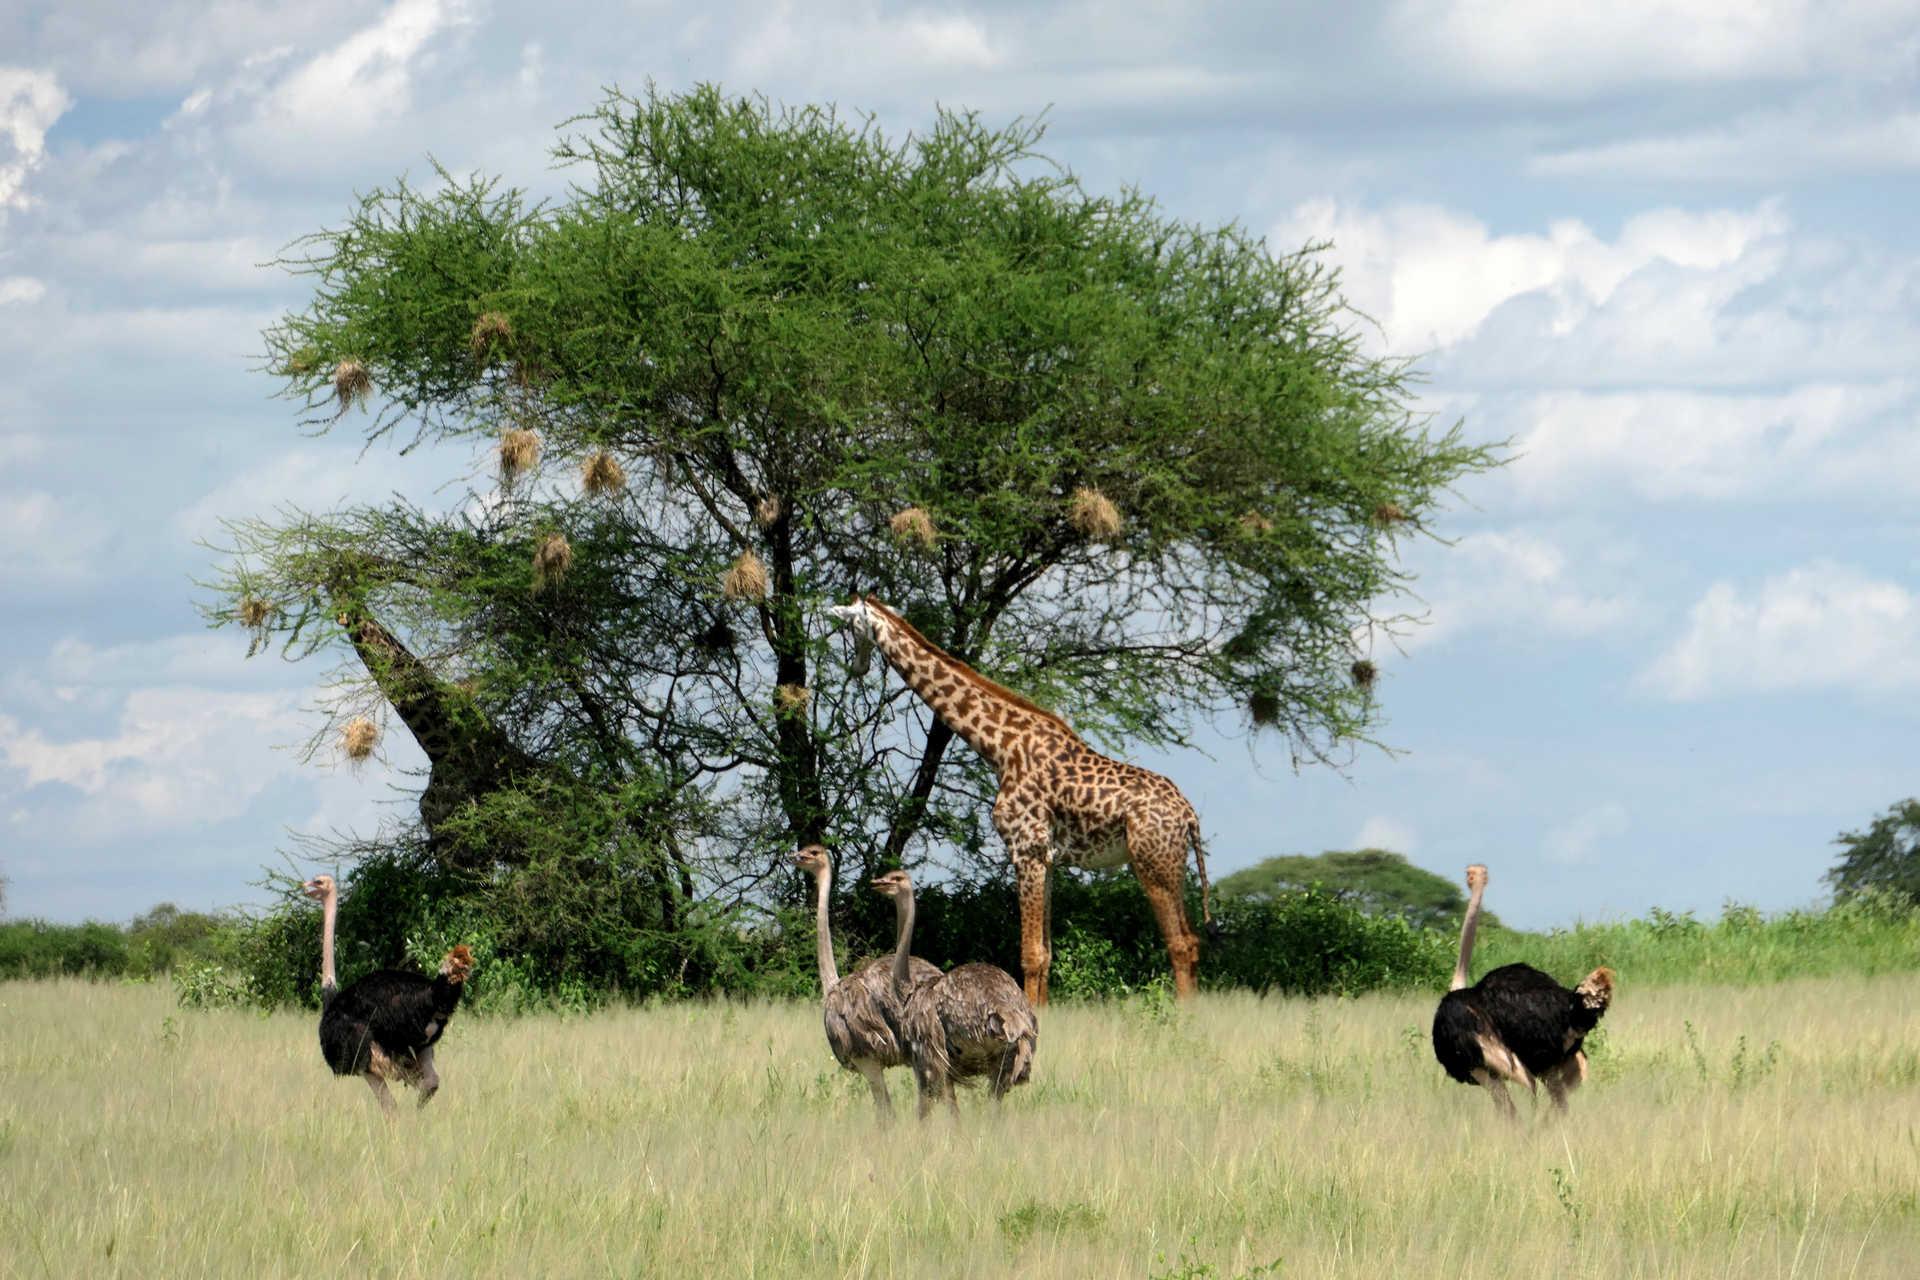 Wild animals in a Tanzanian Park